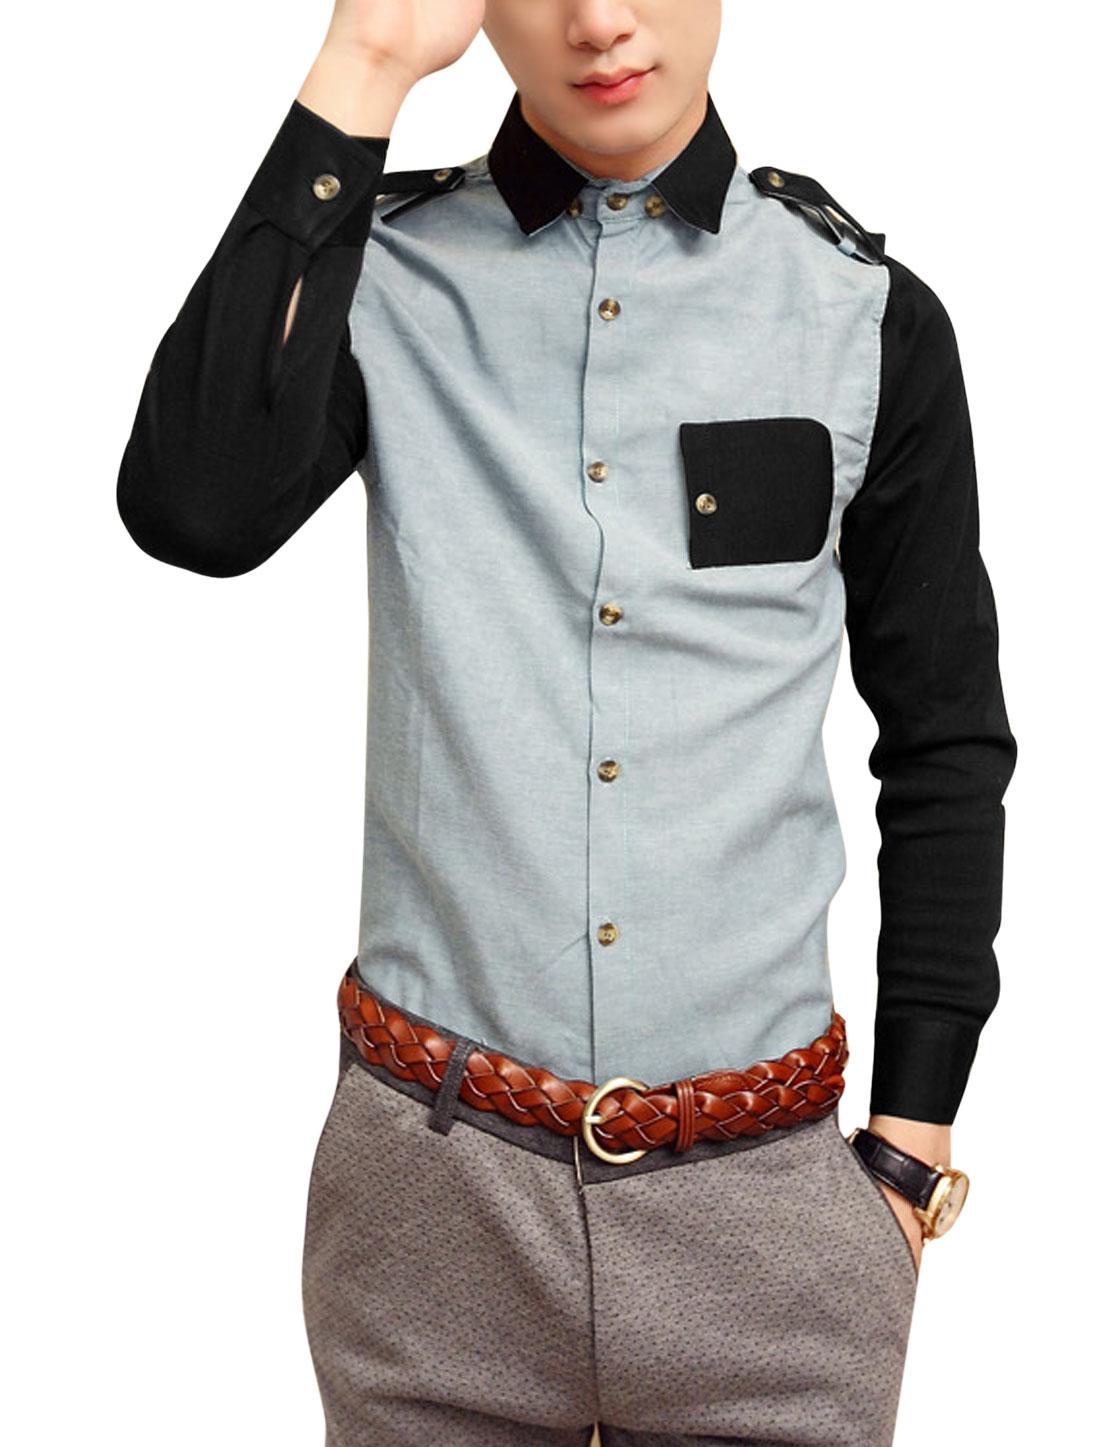 Men Long Sleeve Button Closure Epaulette Decor Shirt Light Gray M